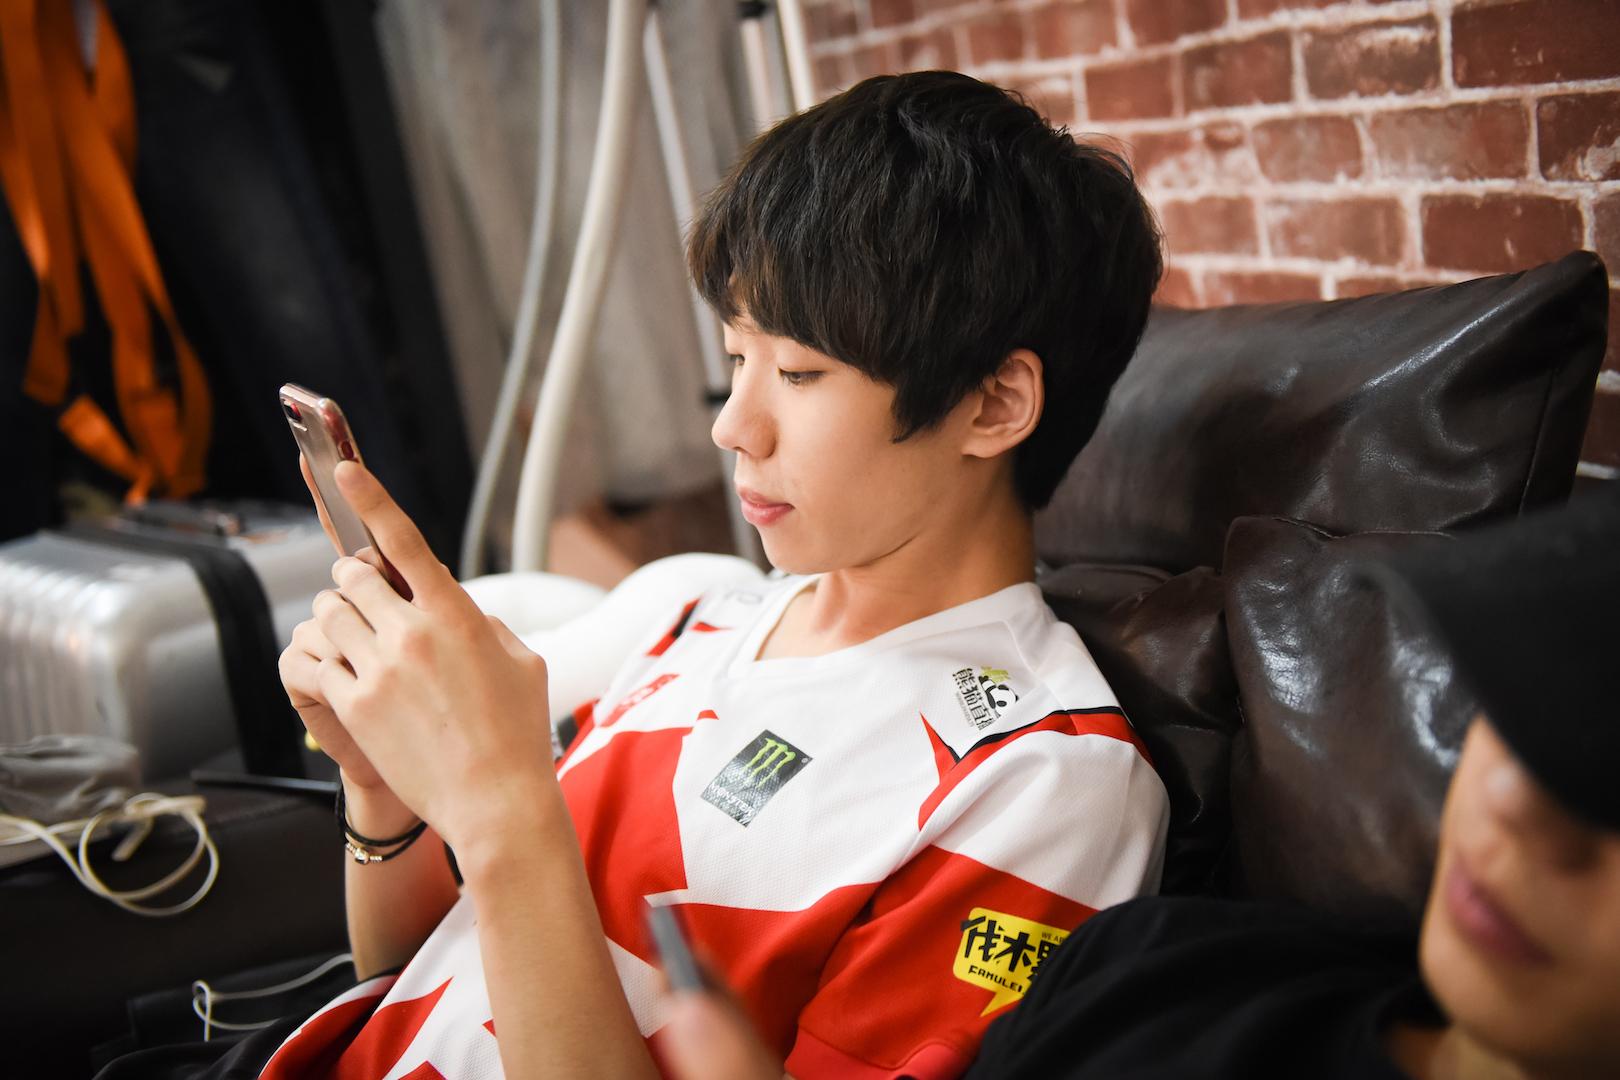 s7世界总决赛宣传拍摄花絮系列①